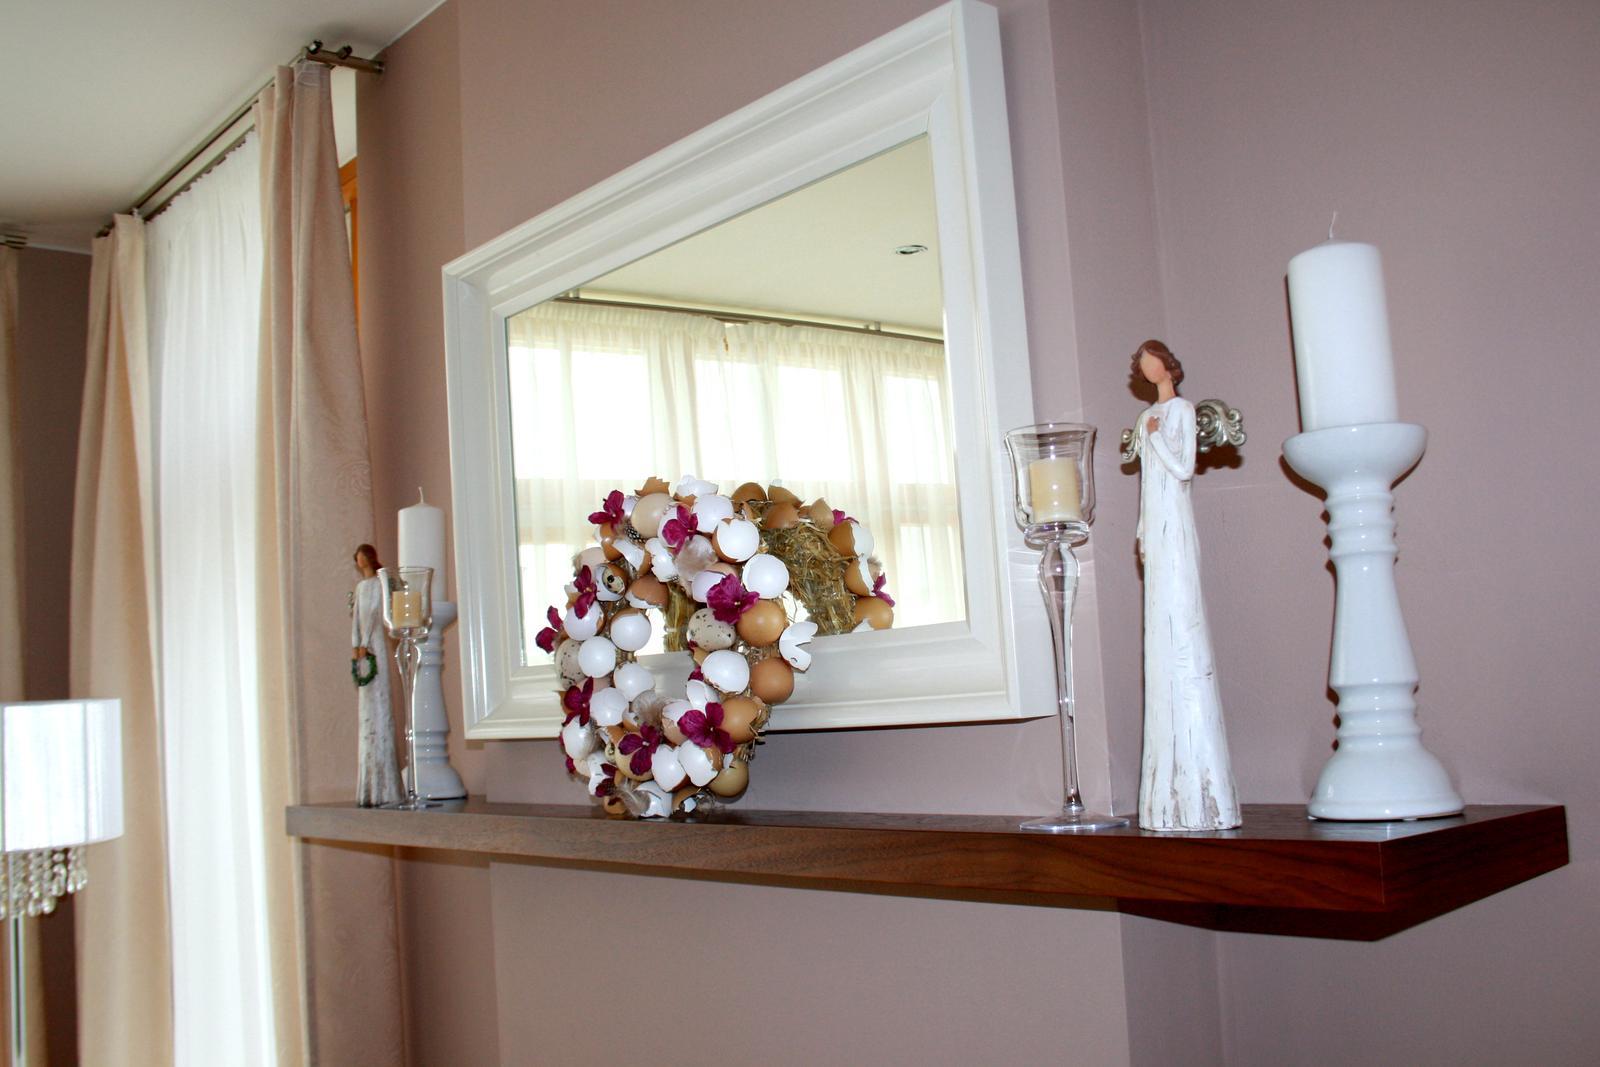 Jarne a letne aranzmany a dekoracie - Obrázek č. 65